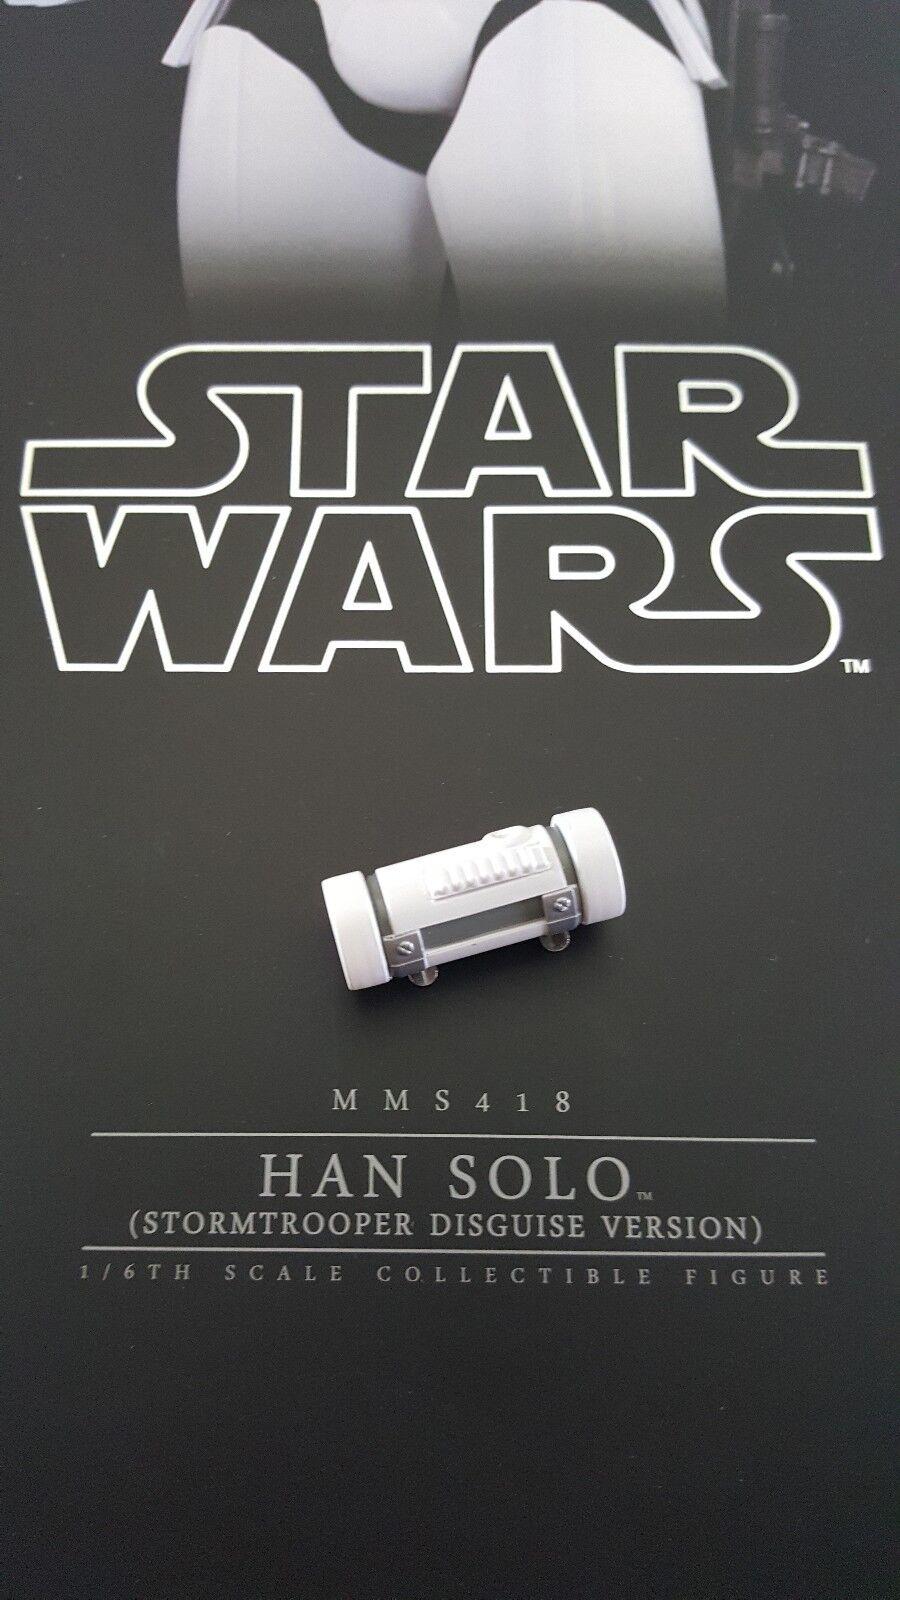 Hot toys 1 6 Star Wars Han Solo Stormtrooper action figure's thermal detonator